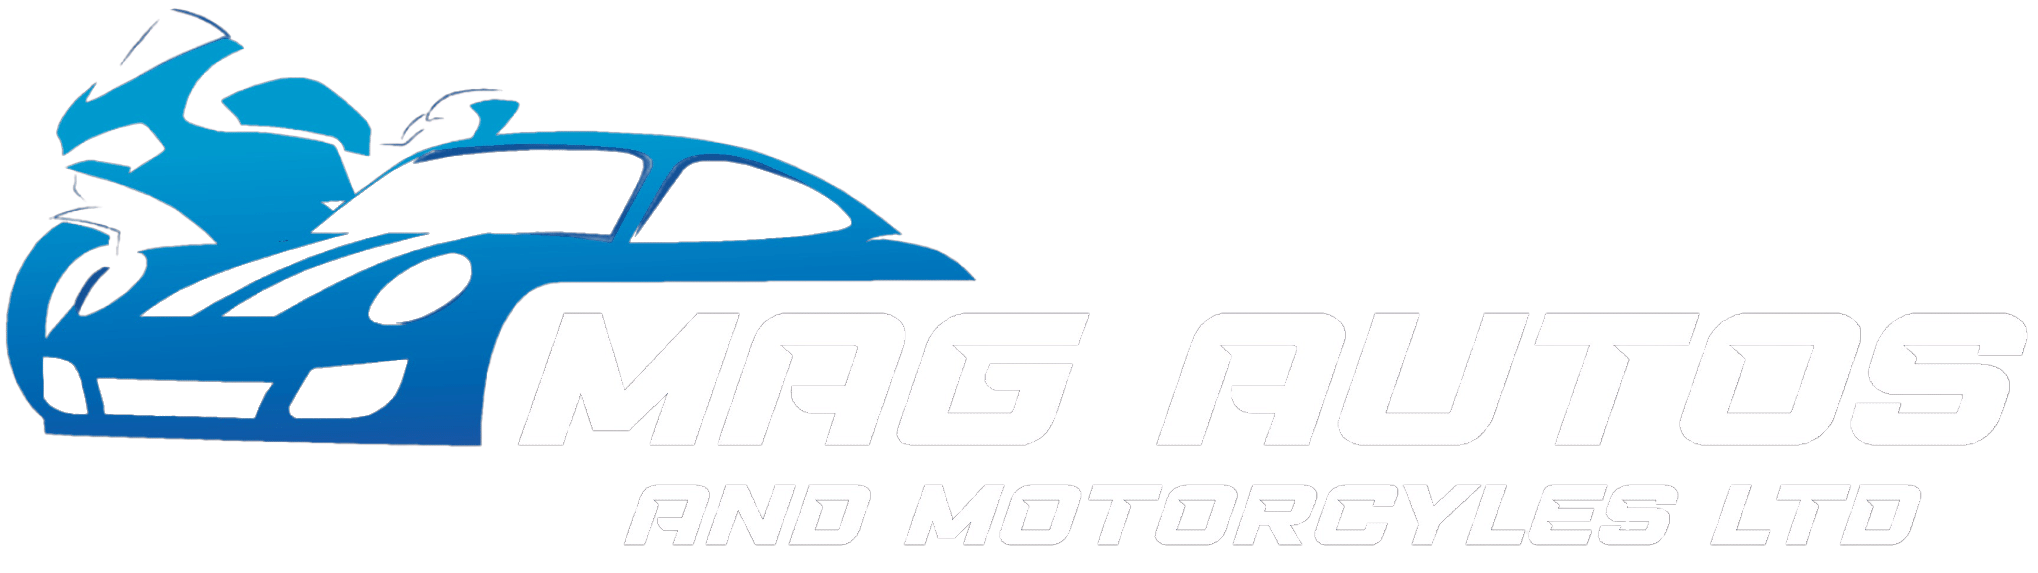 MAG Autos & Motorcycles - 2021 Final Website Logo